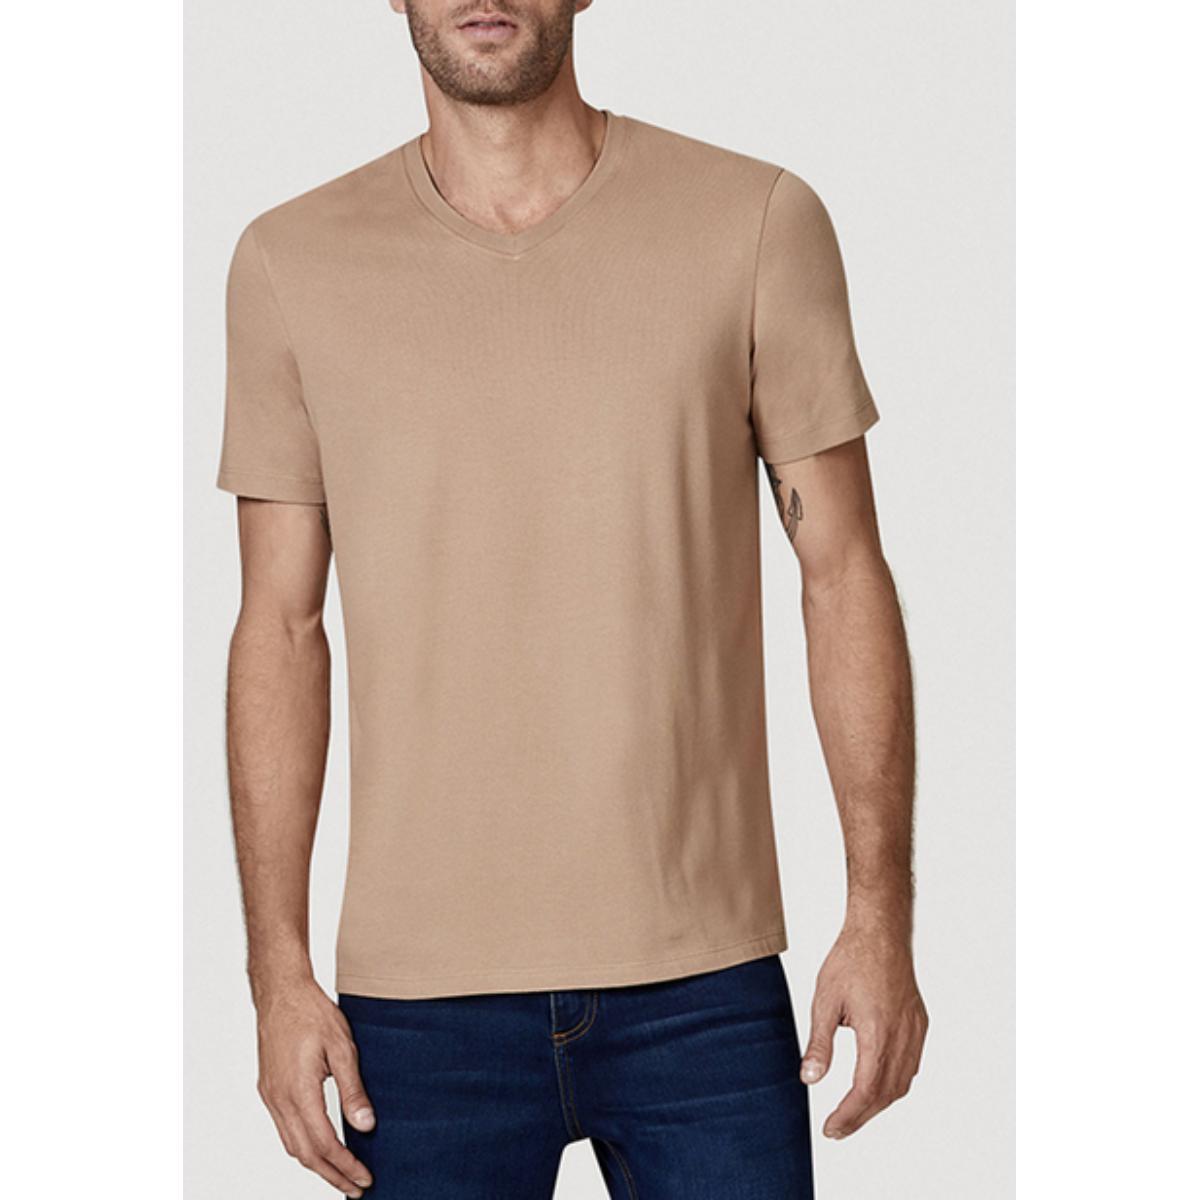 Camiseta Masculina Hering 022b Hlden Marrom Claro